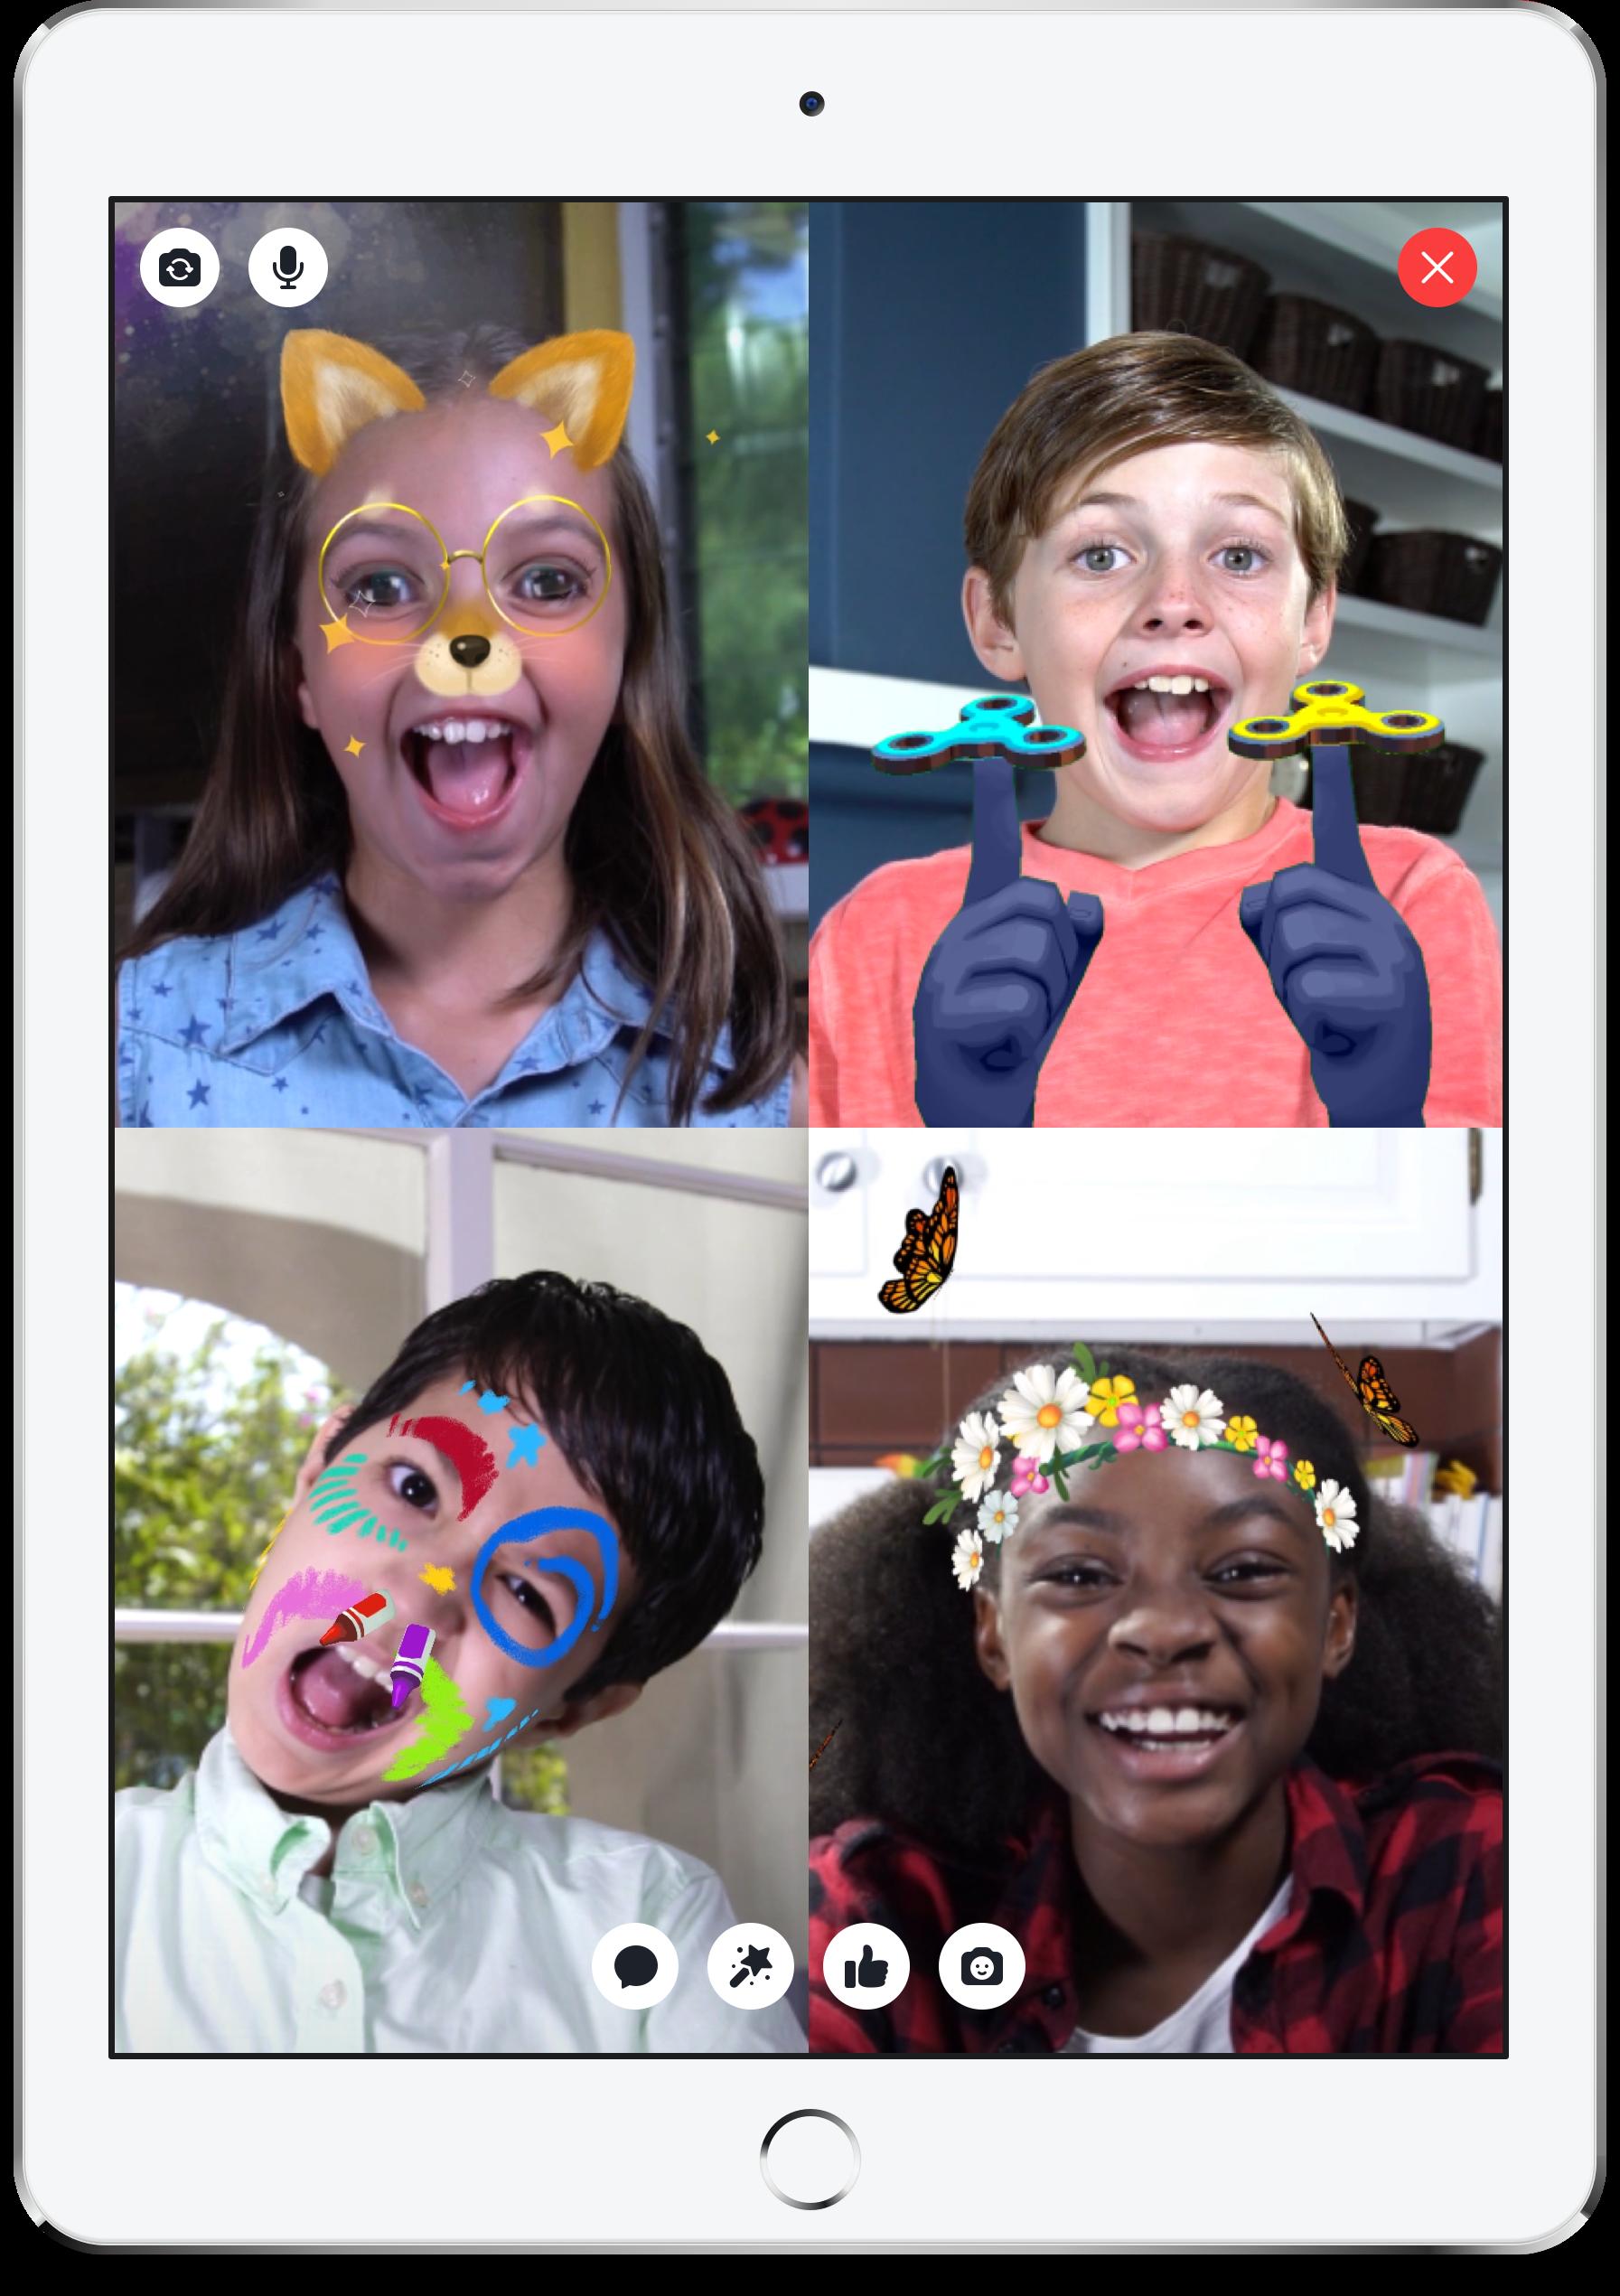 Facebook's new Messenger kids app for pre-teens.